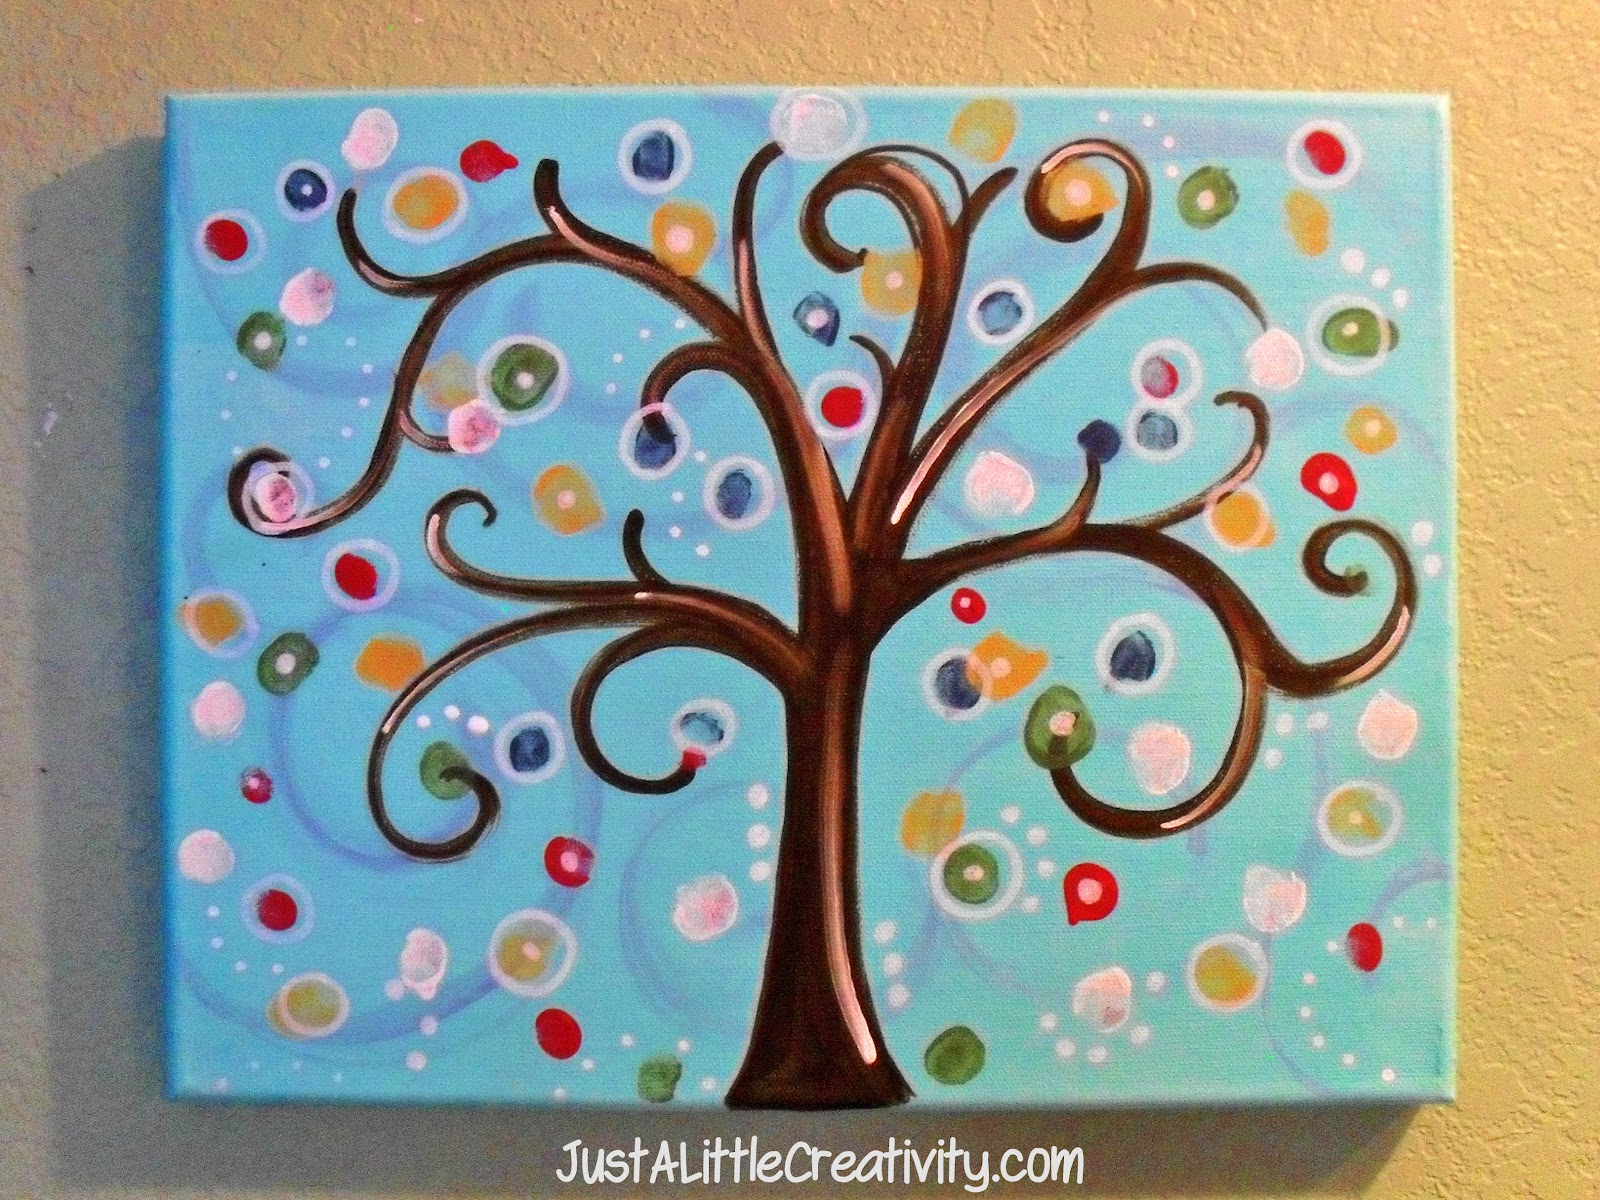 Creative Family Tree Ideas For Kids Diy thumbprint tree- modernFamily Tree Ideas For Kids Project